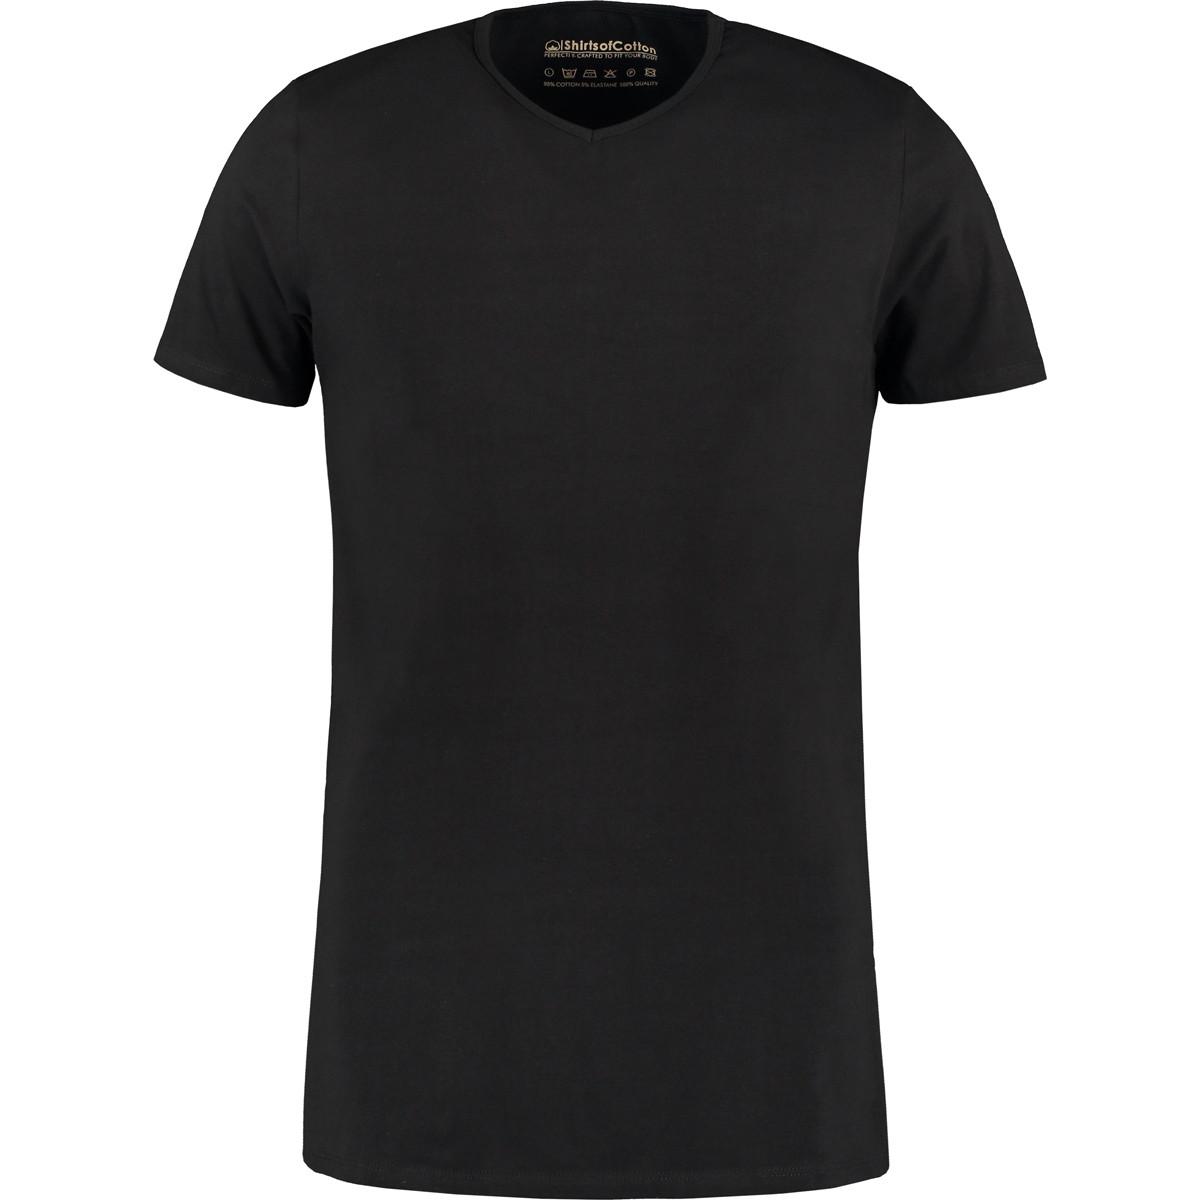 Black Shirts zwart t-shirt extra lang v-hals HCBEKEF